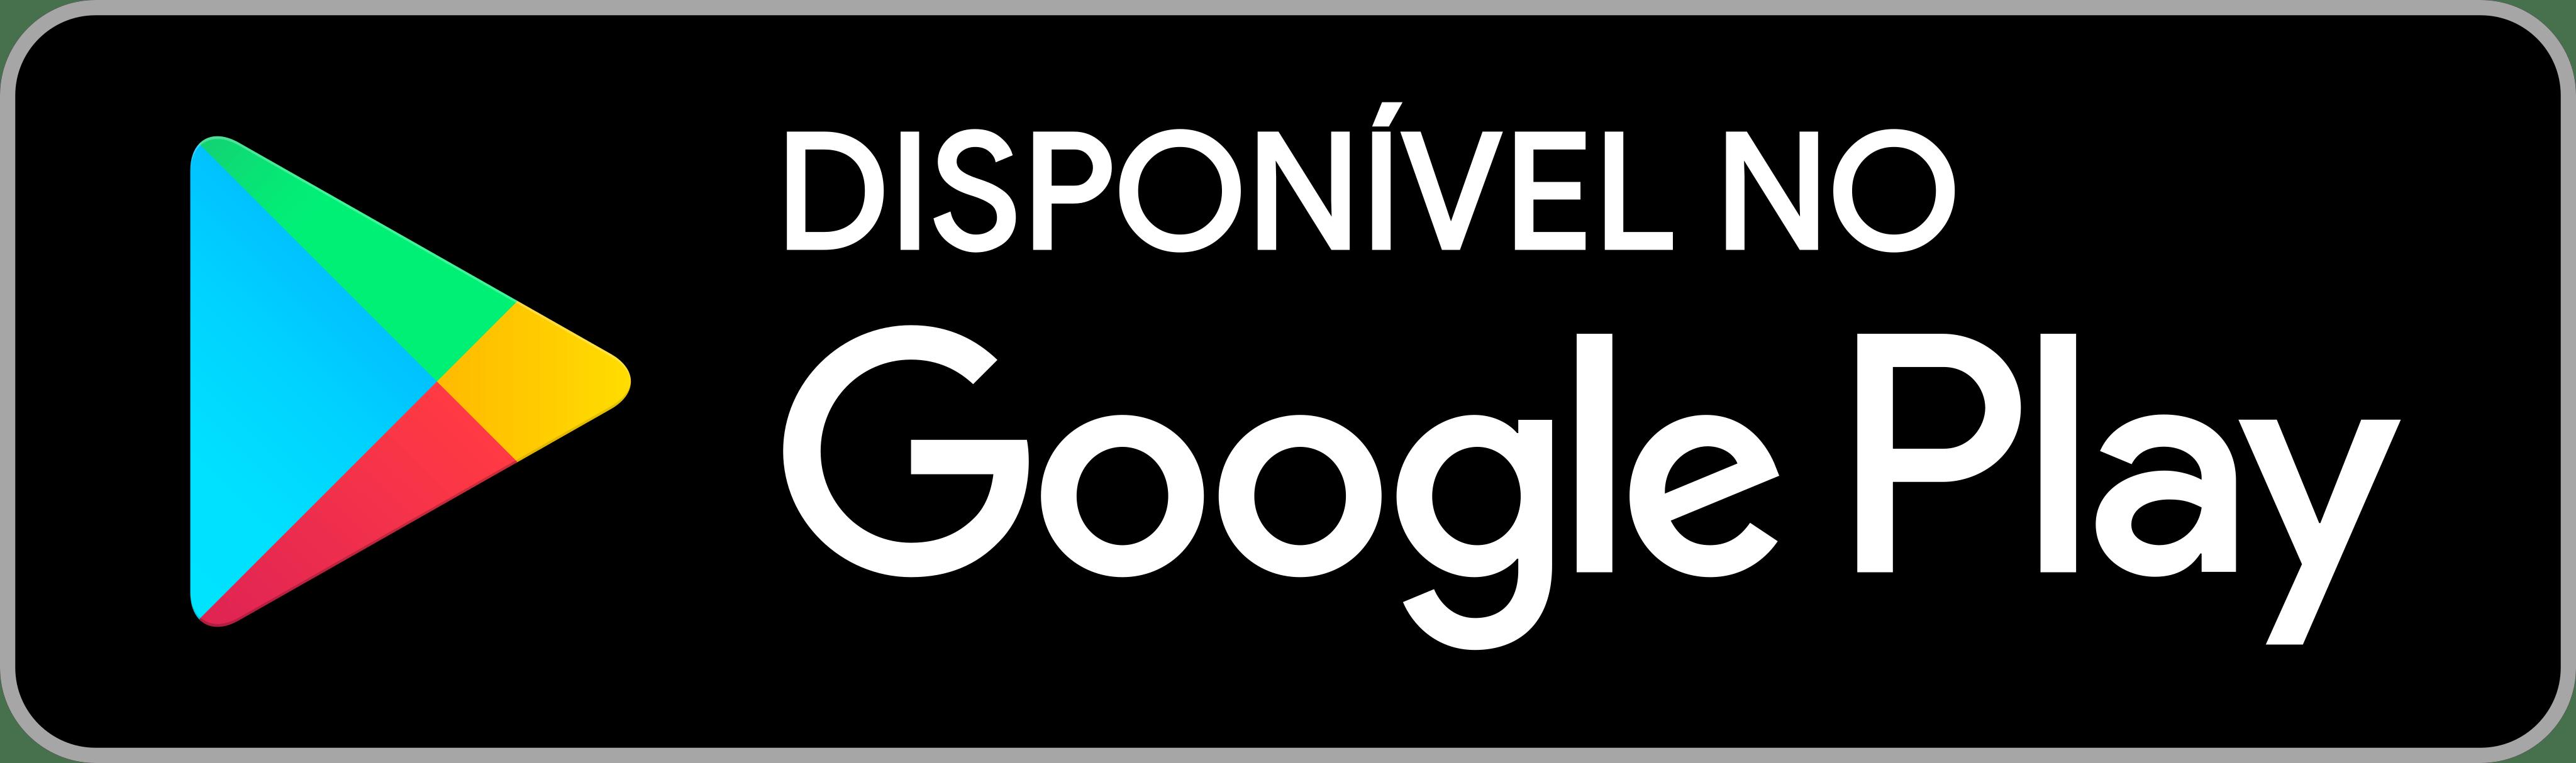 disponivel-google-play-badge